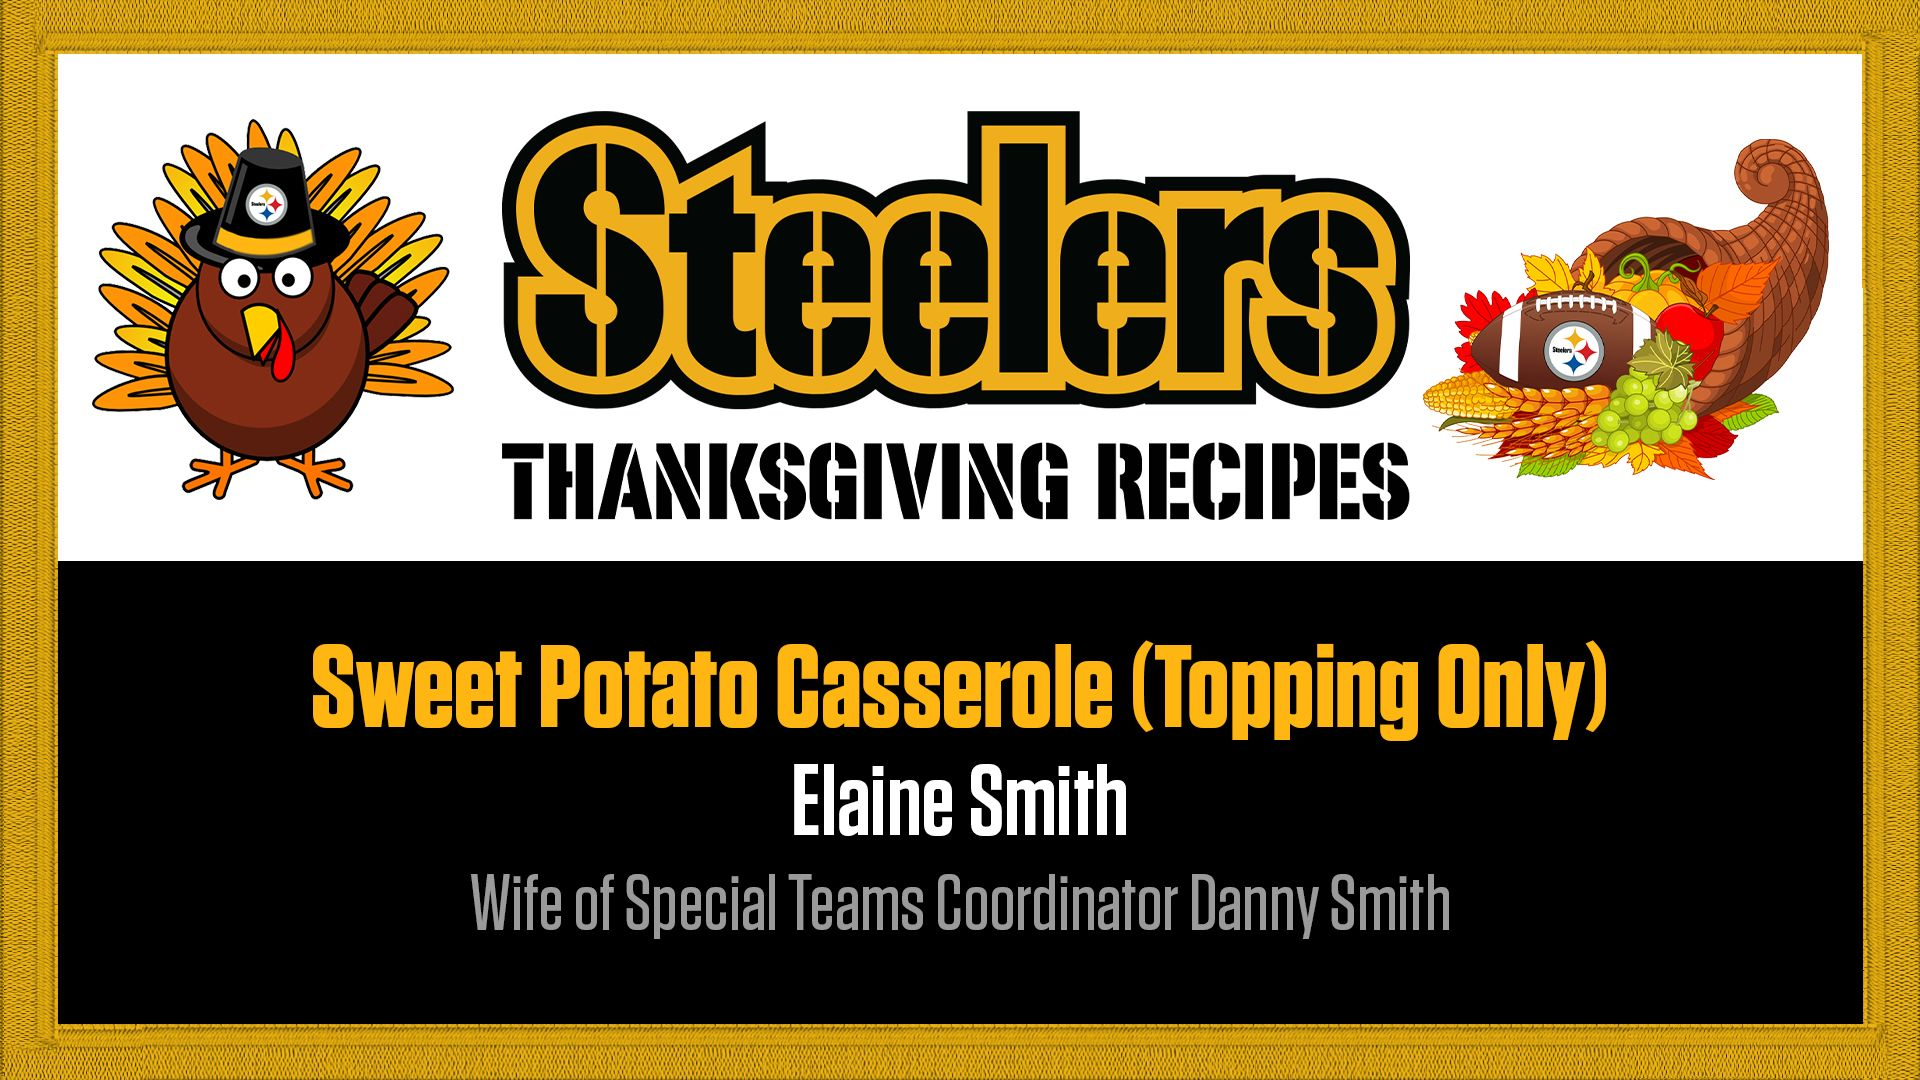 Recipe - sweet potato casserole topping_elaine smith